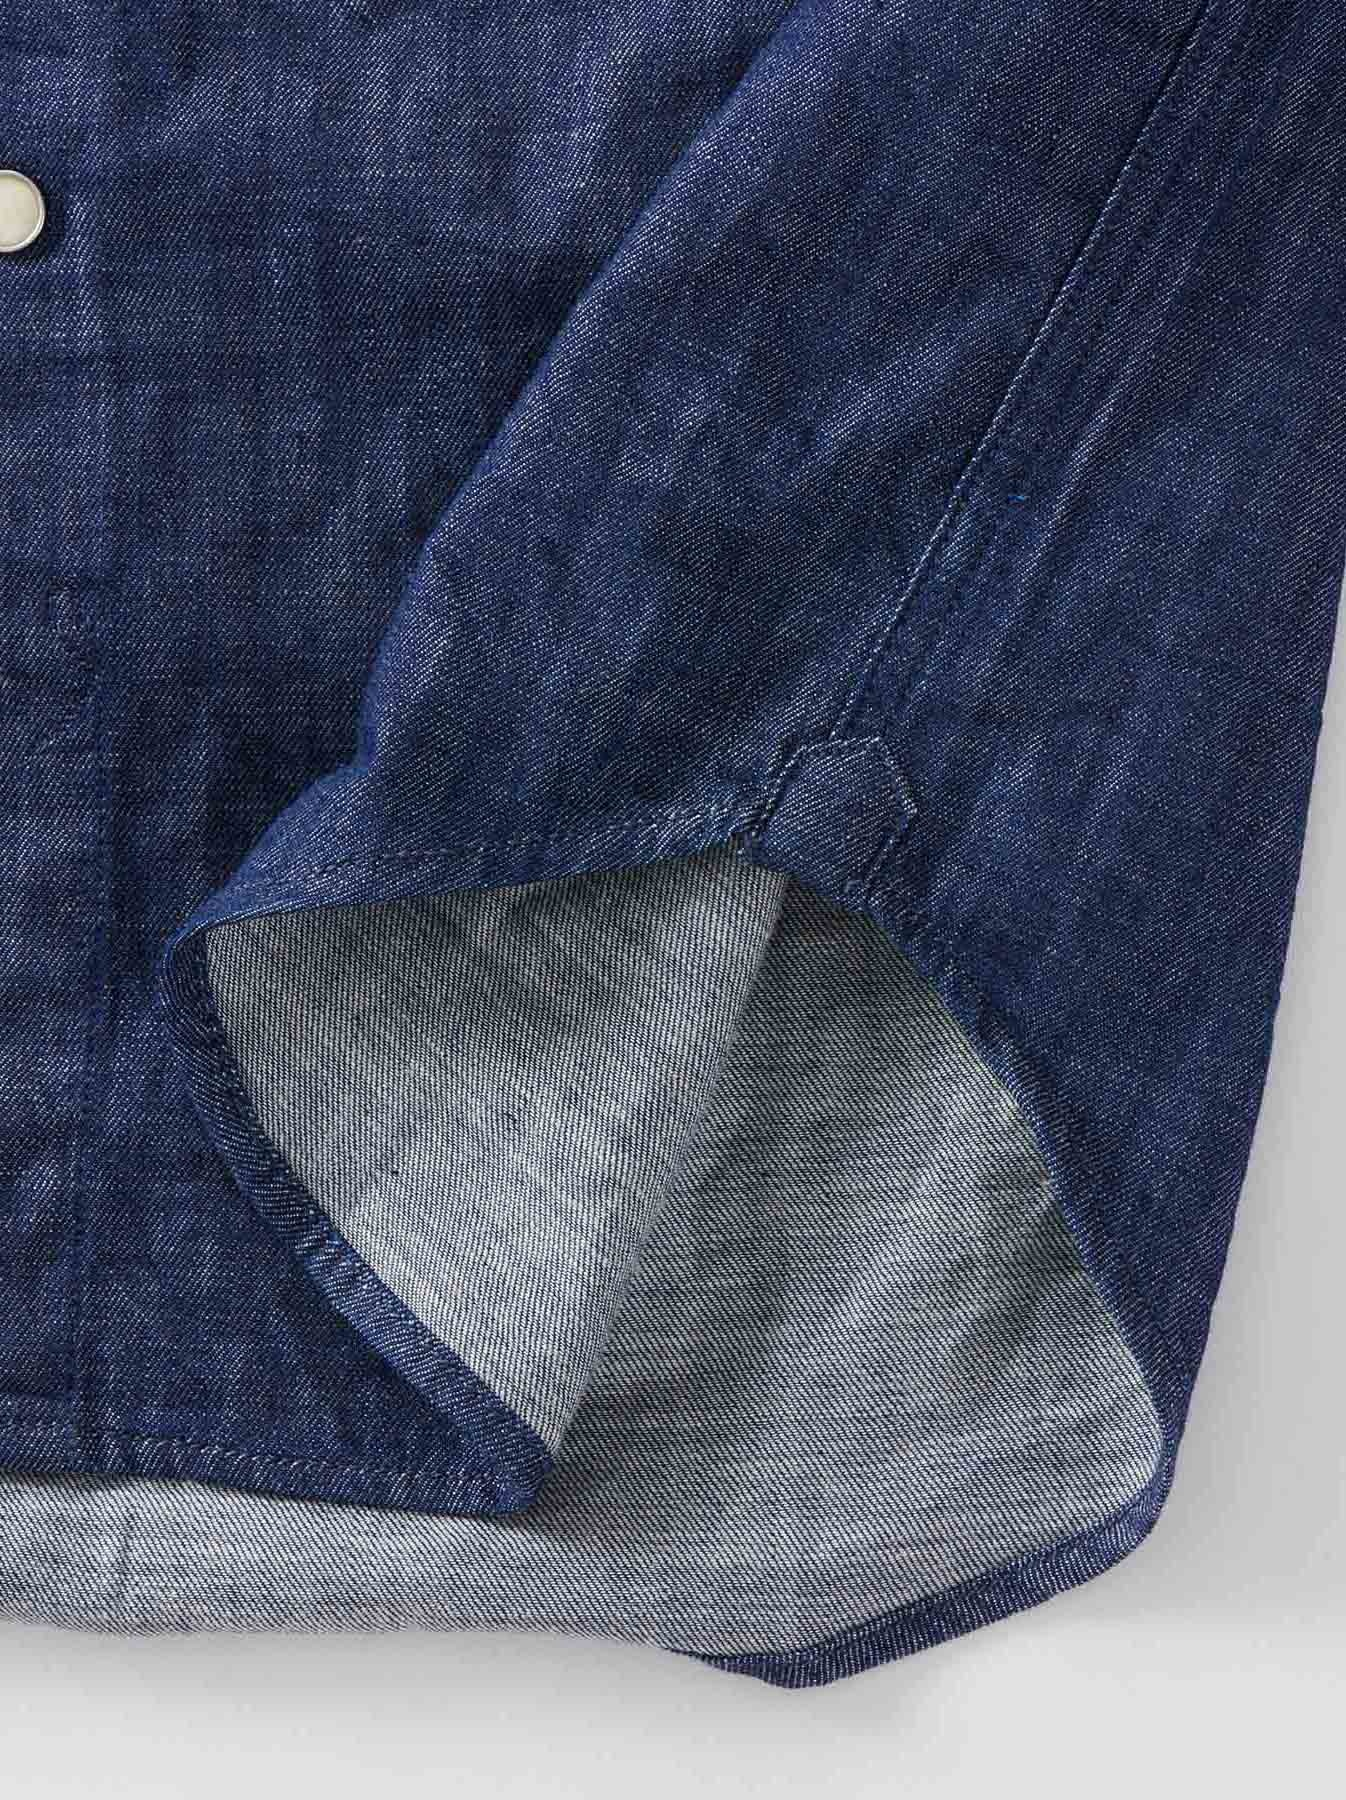 Goma Denim Stand Collar Eastern Shirt-10